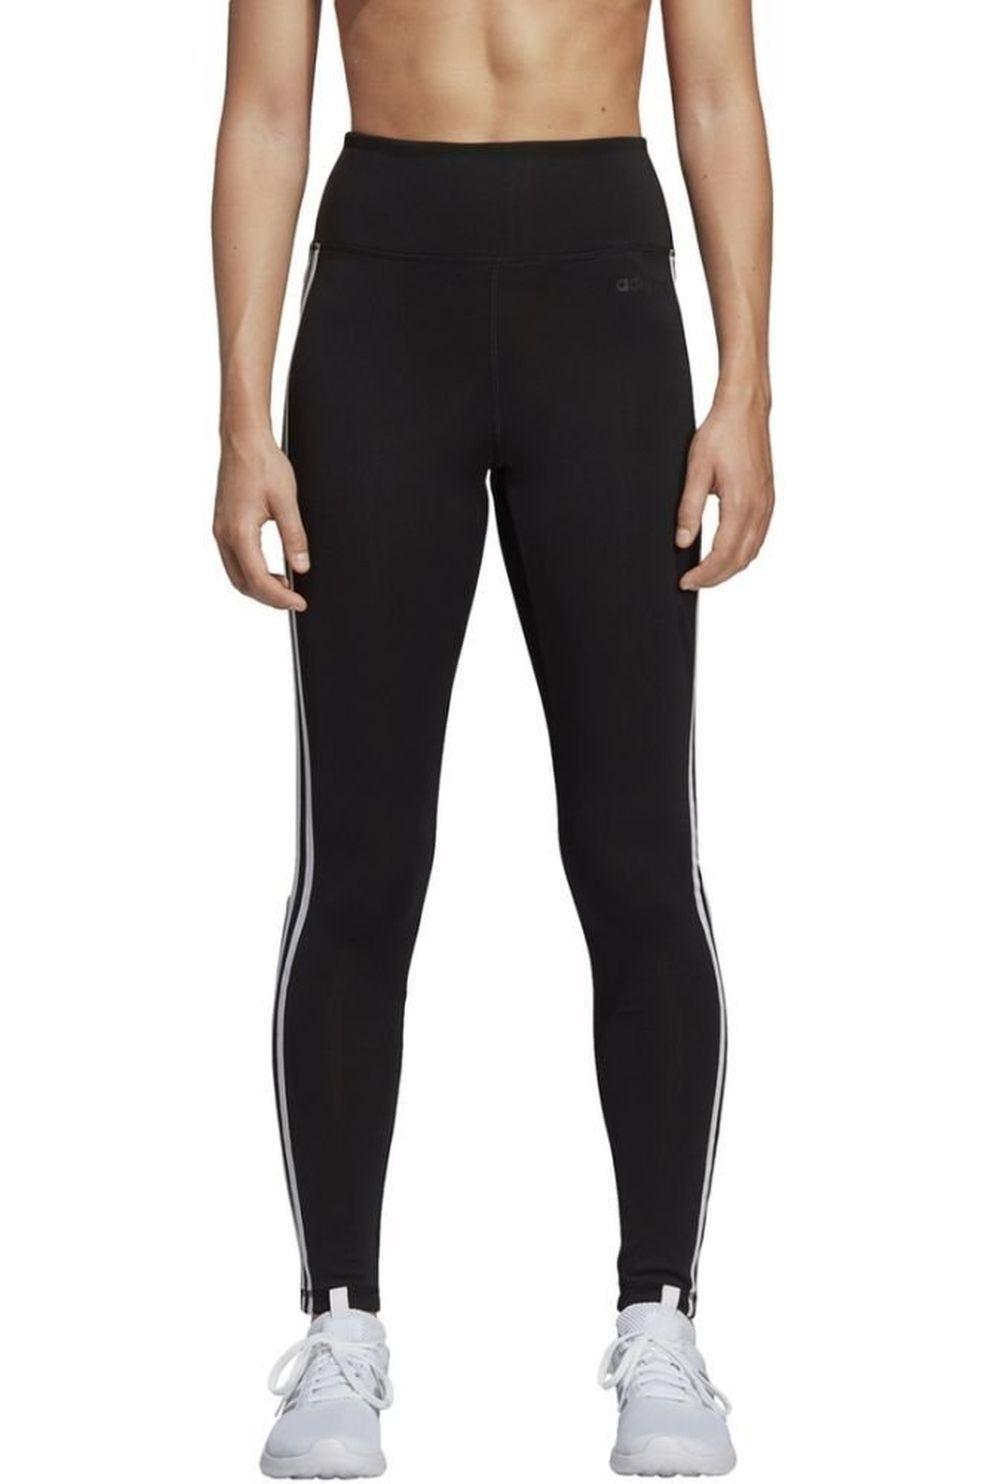 adidas Legging Design 2 Move 3-Stripes High-Rise Long voor dames - Zwart - Maten: XS, S, M, L